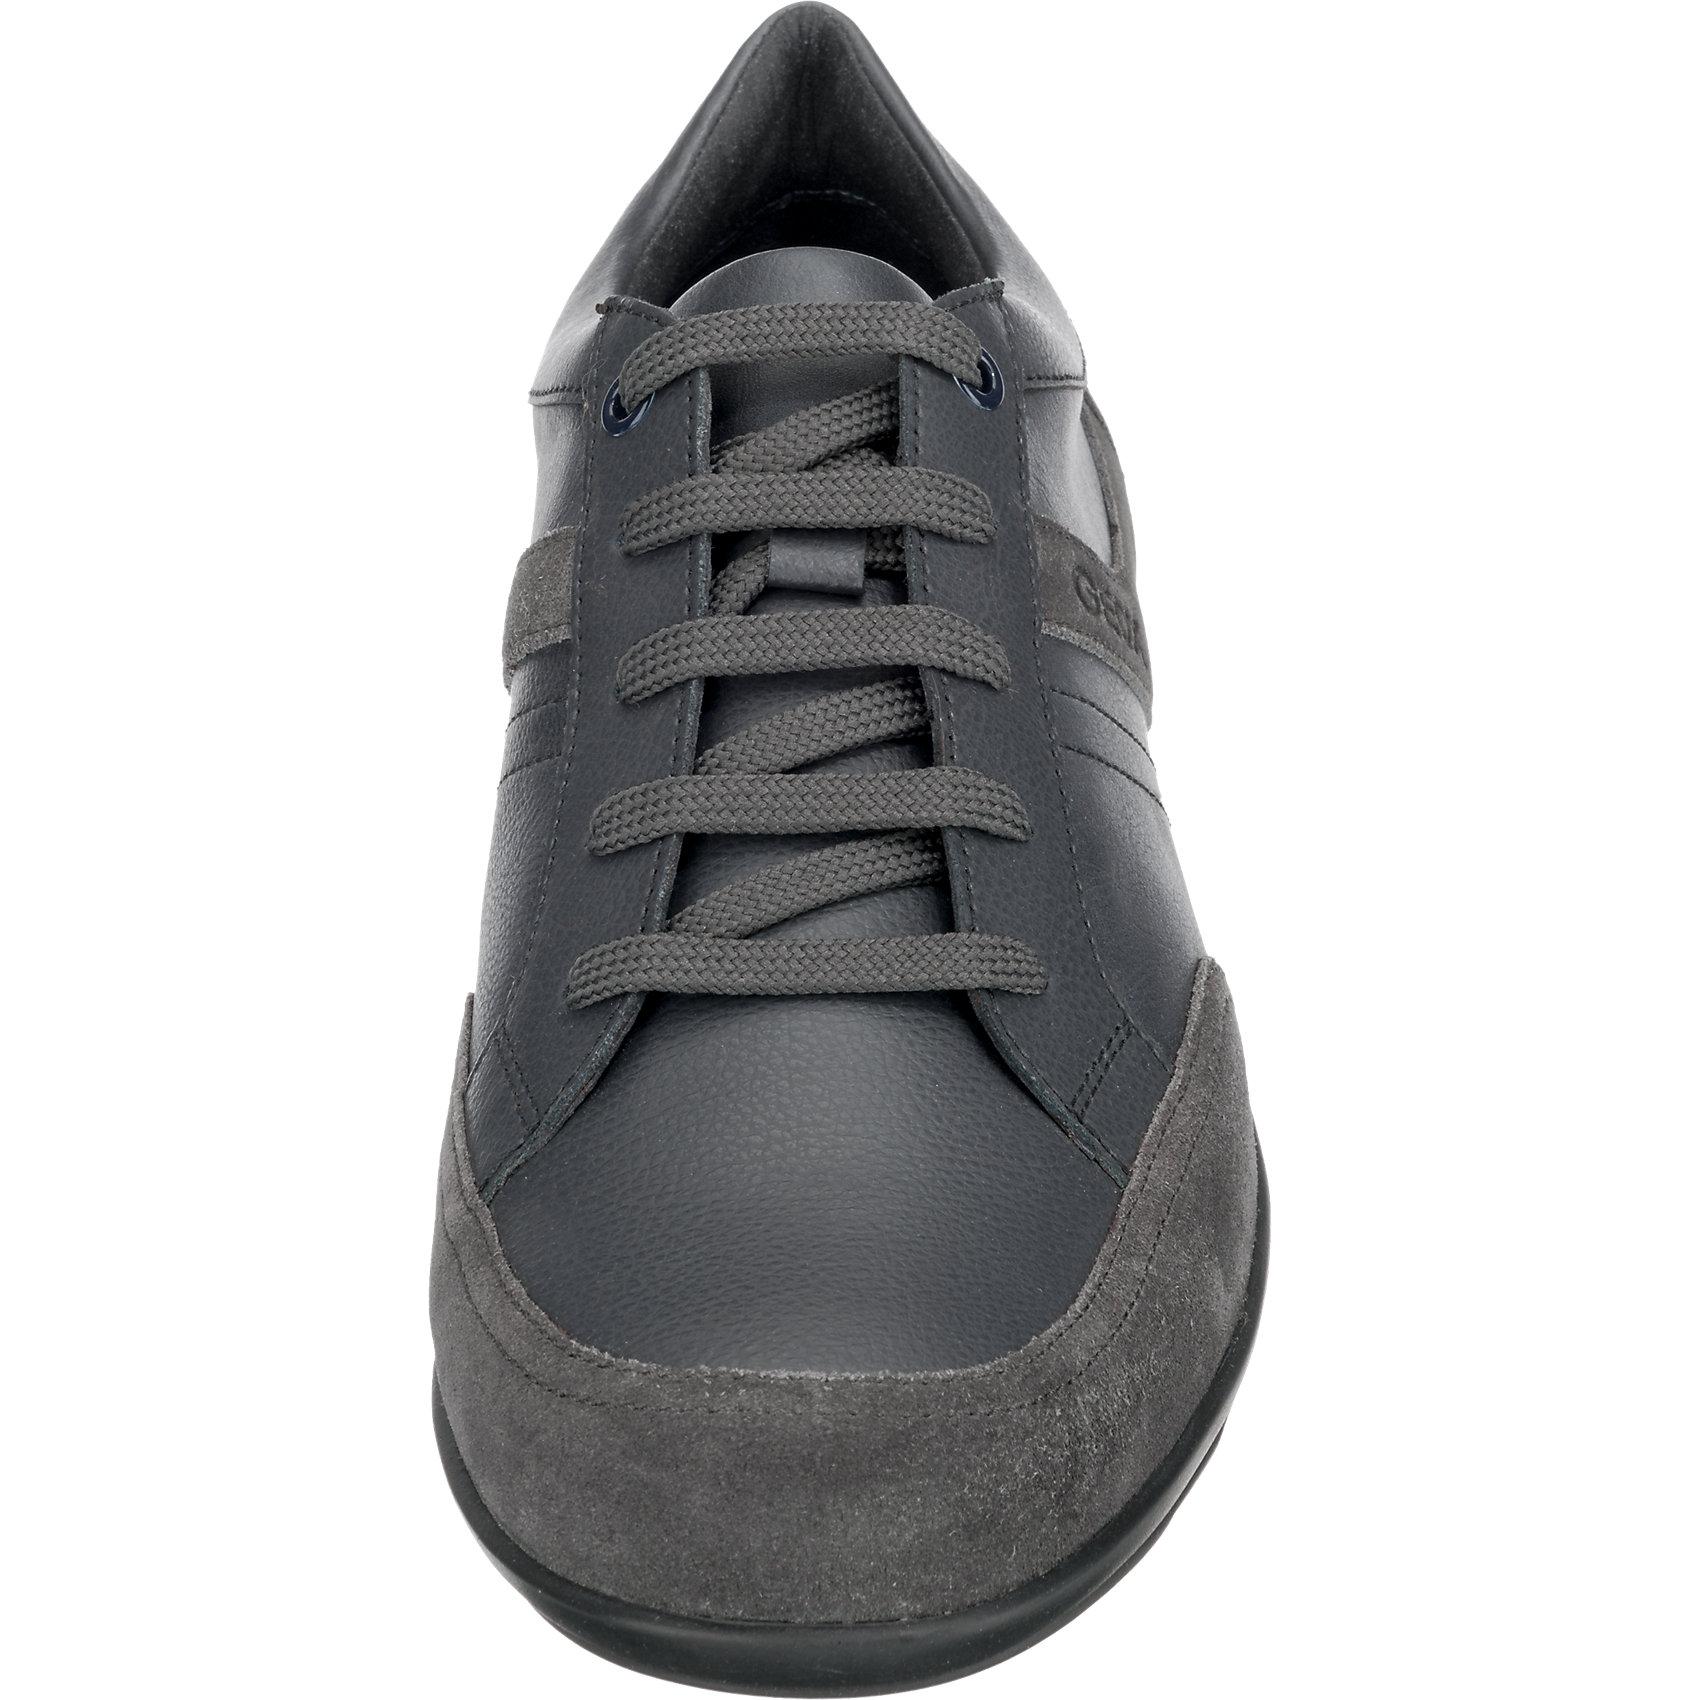 Neu GEOX Padget Sneakers 6846063 für Herren blau-kombi